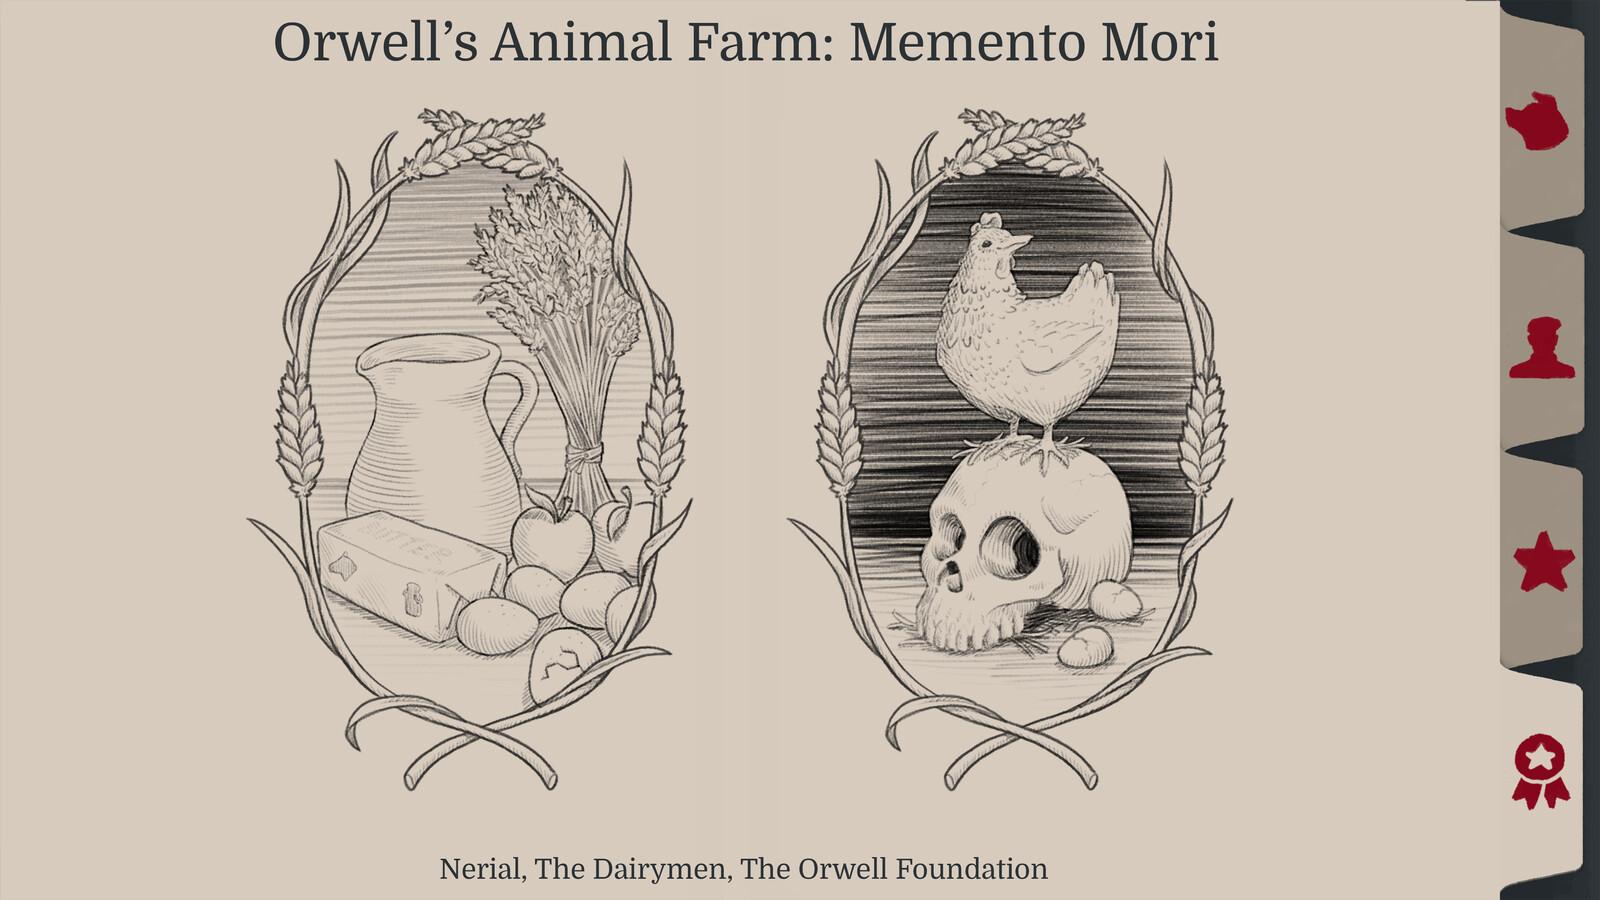 Orwell's Animal Farm: UI Extras